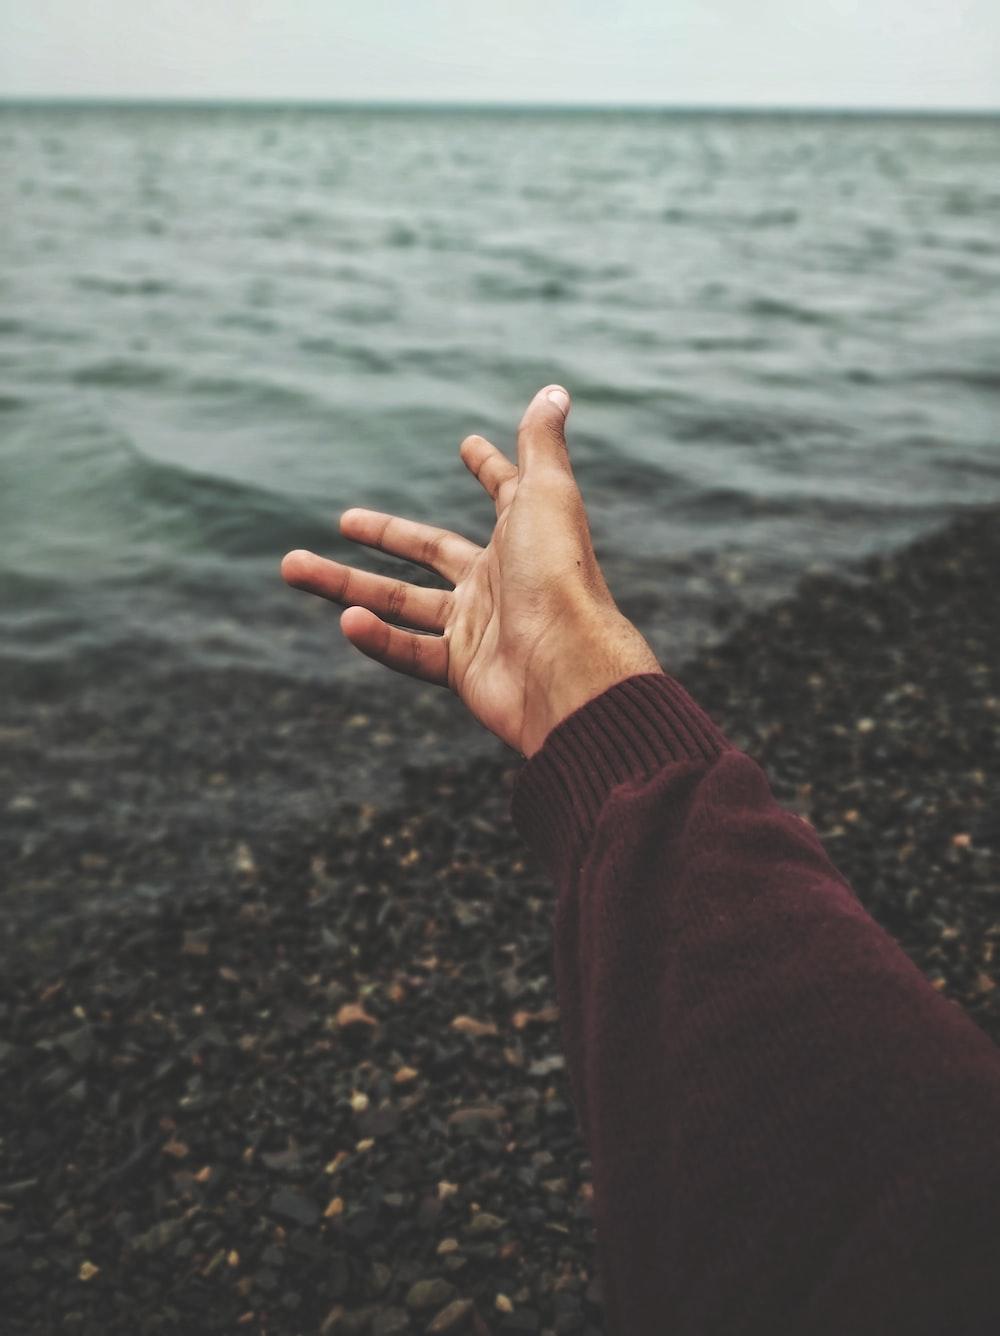 person raising hand near body of water